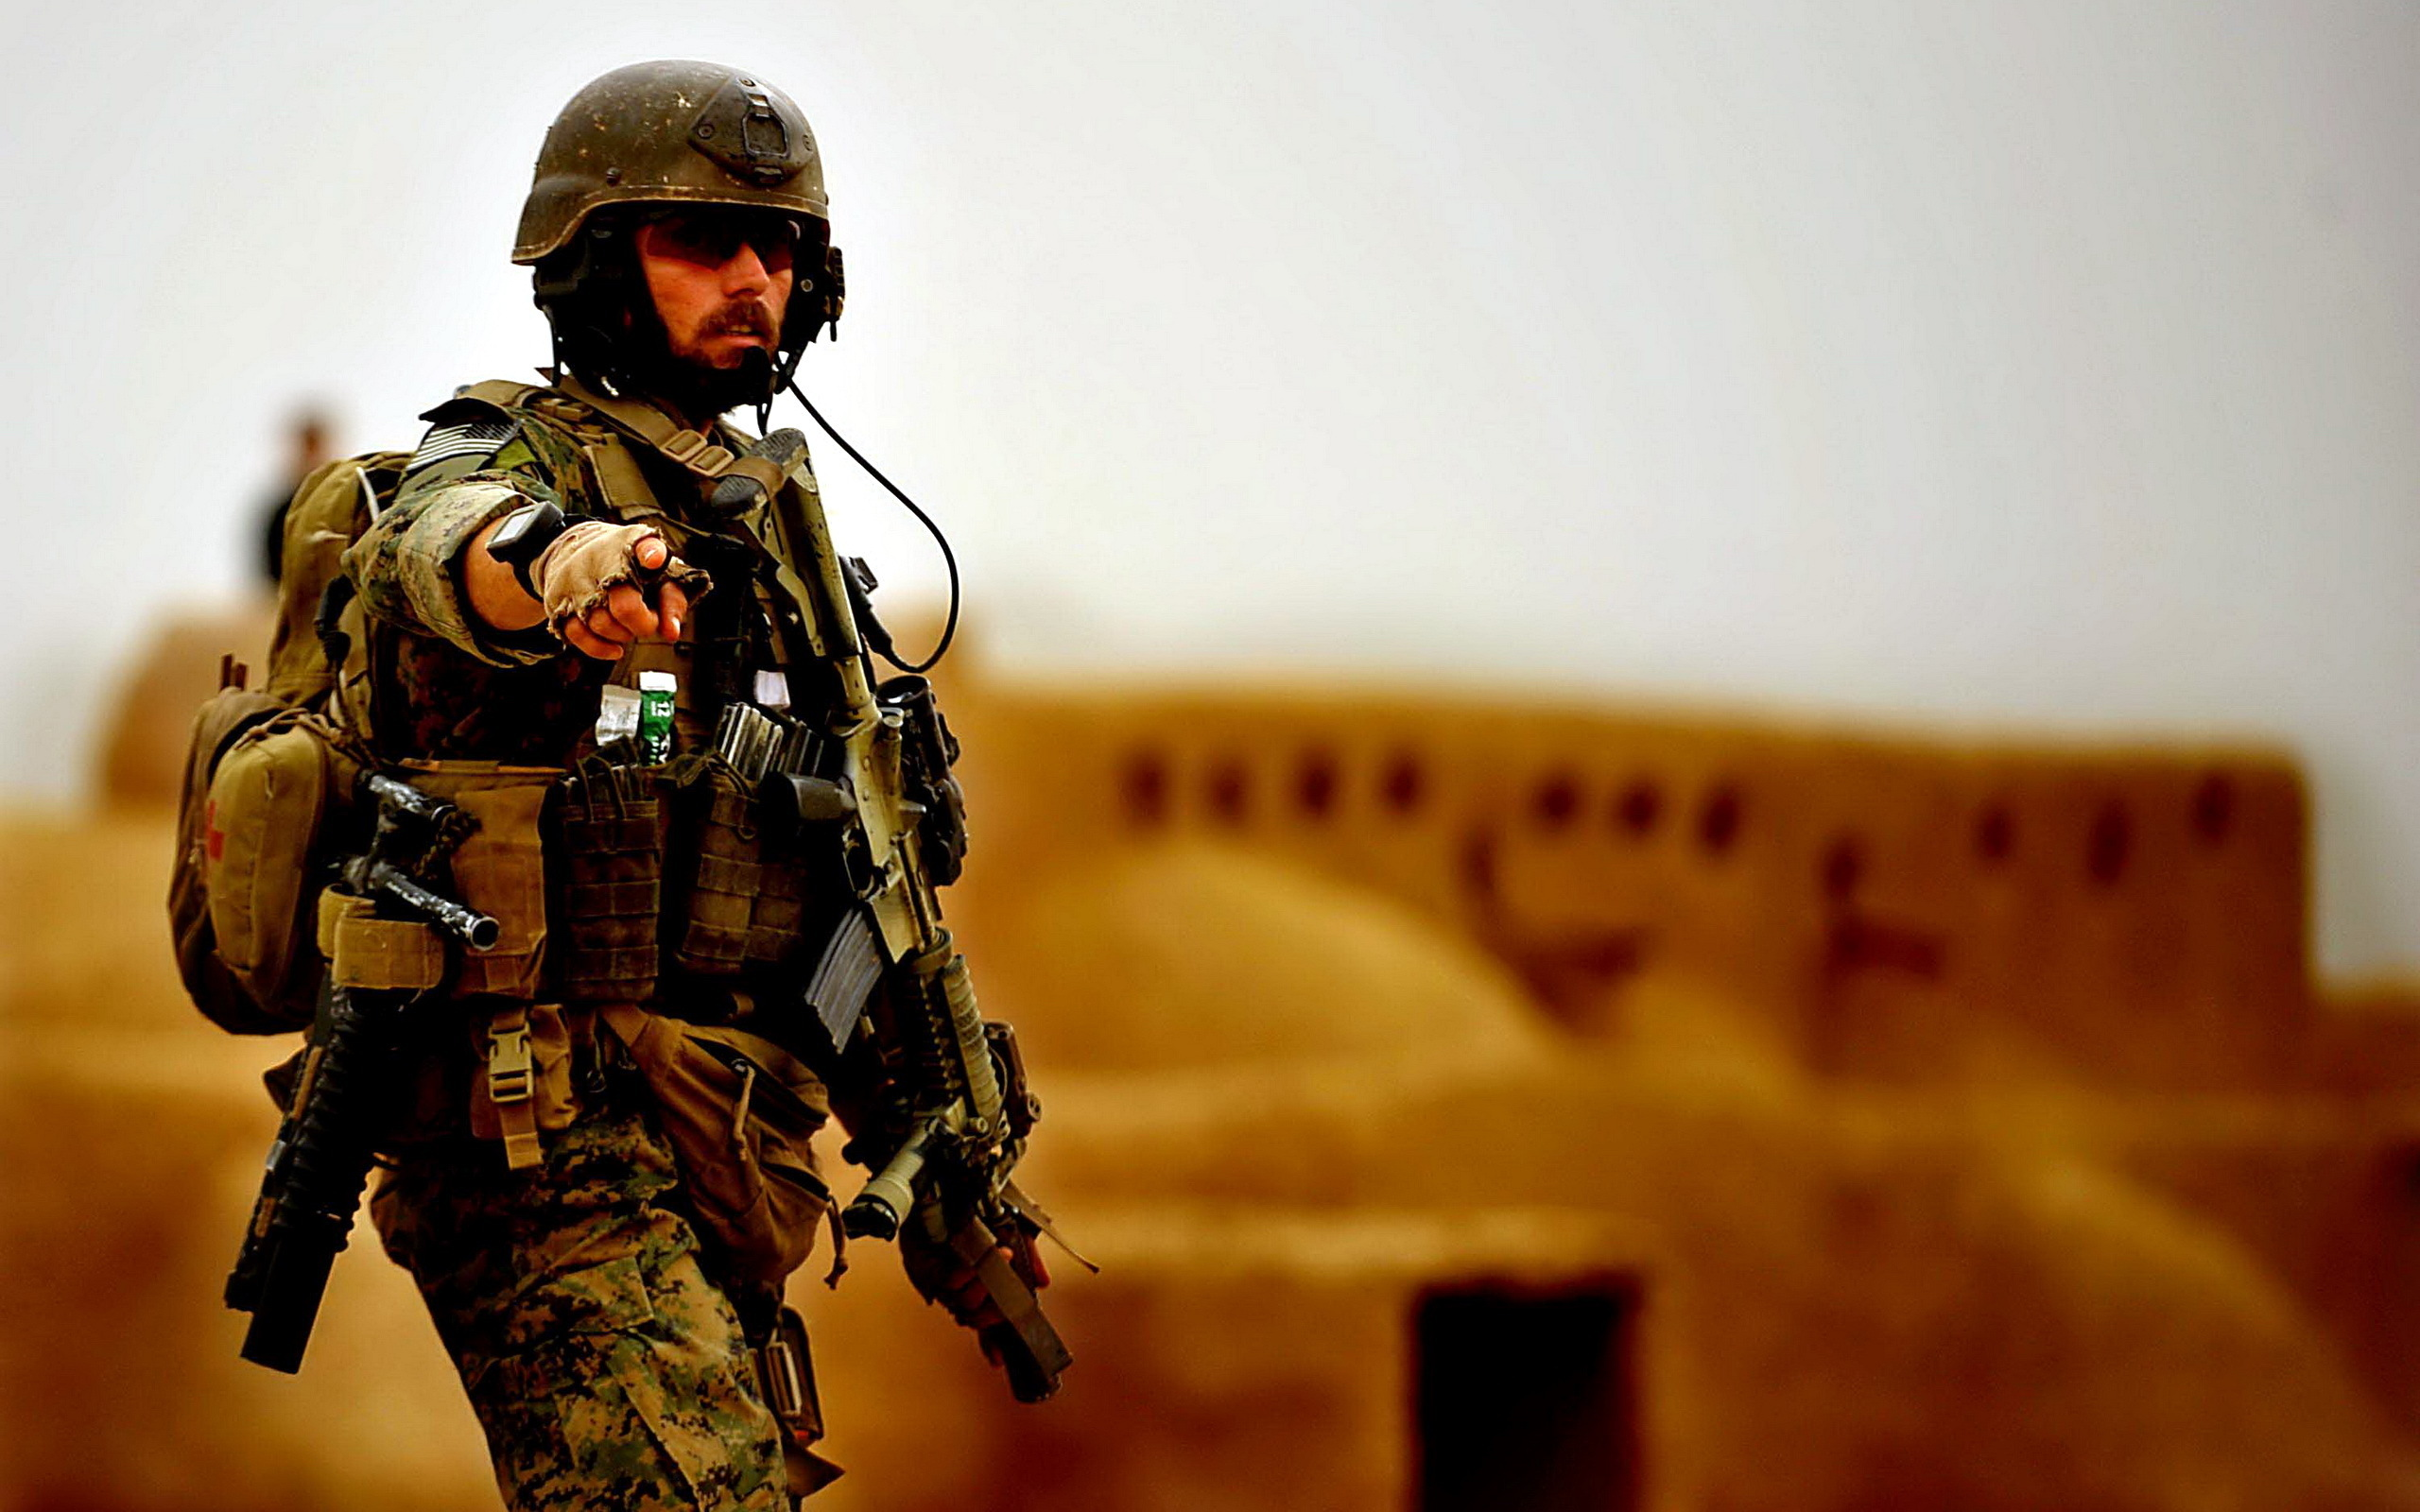 солдат, костюм, форма